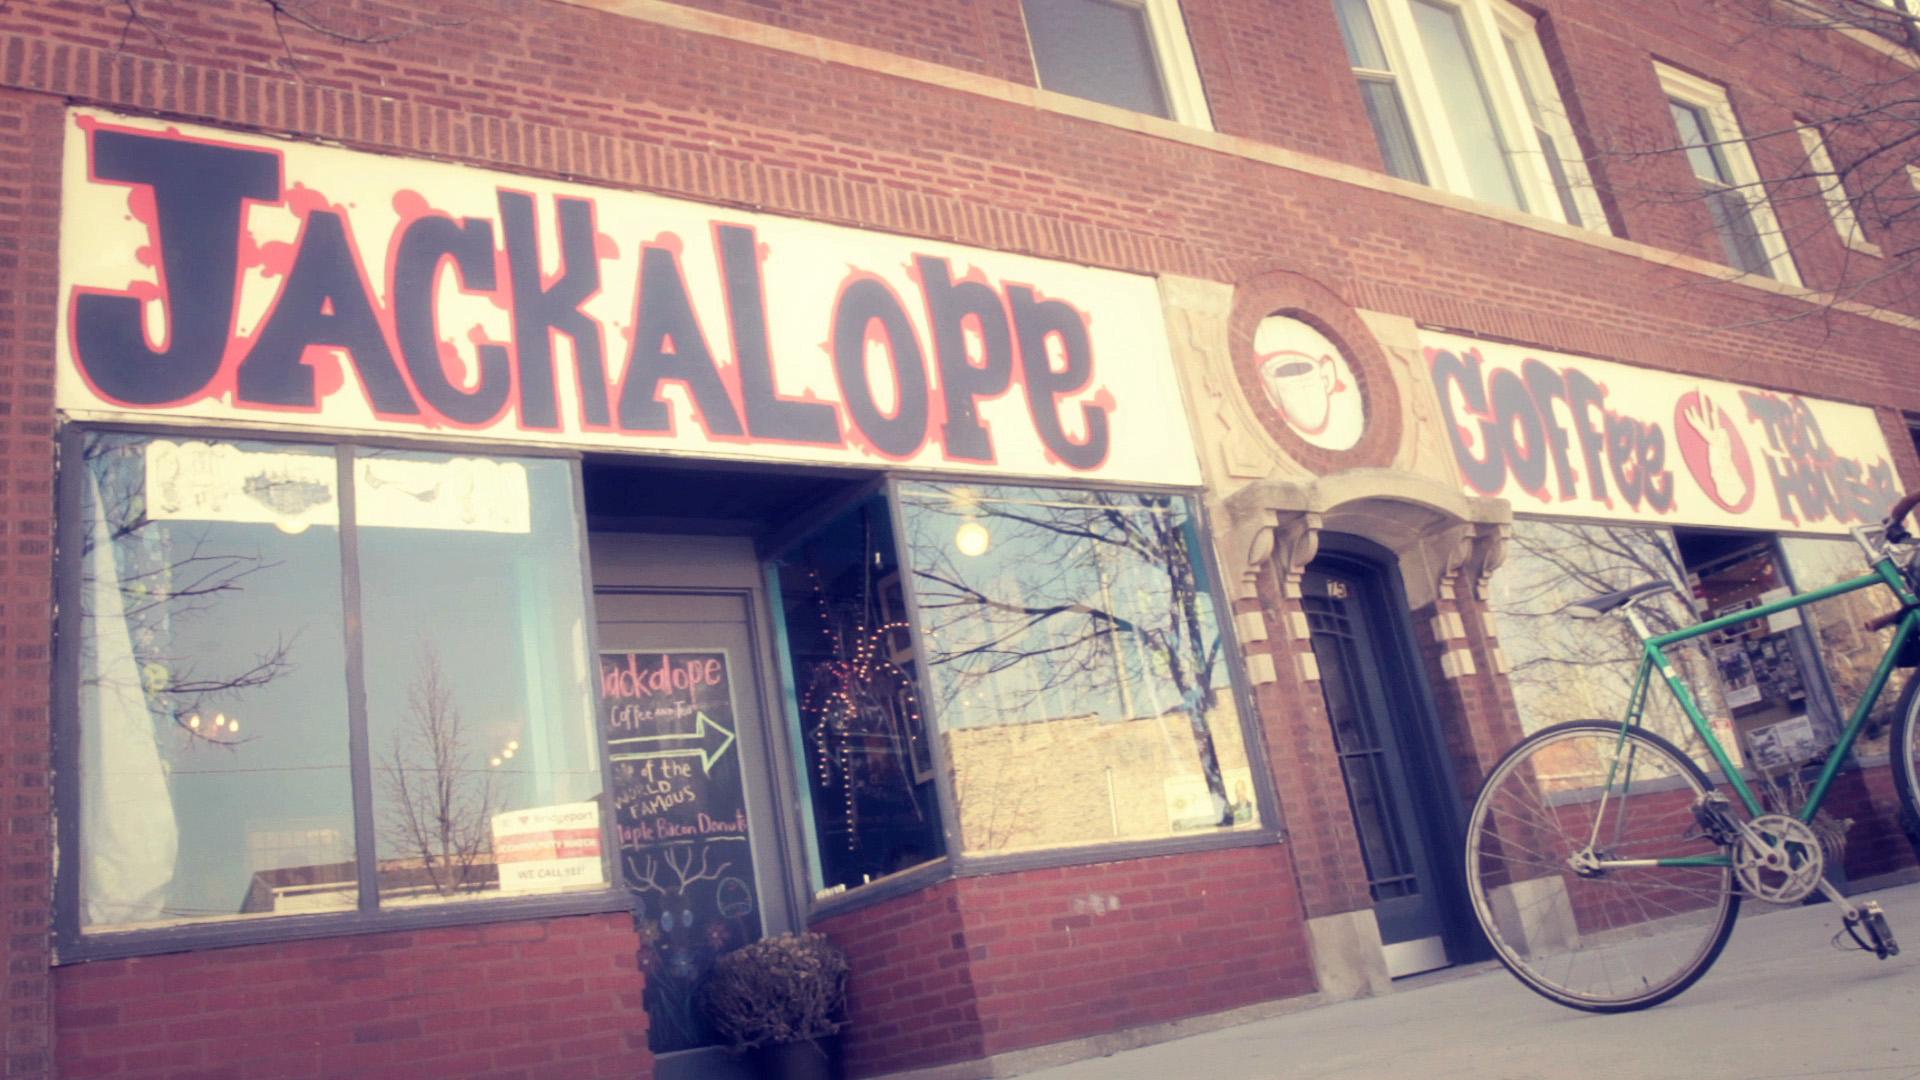 Jackalope Coffee + Tea House